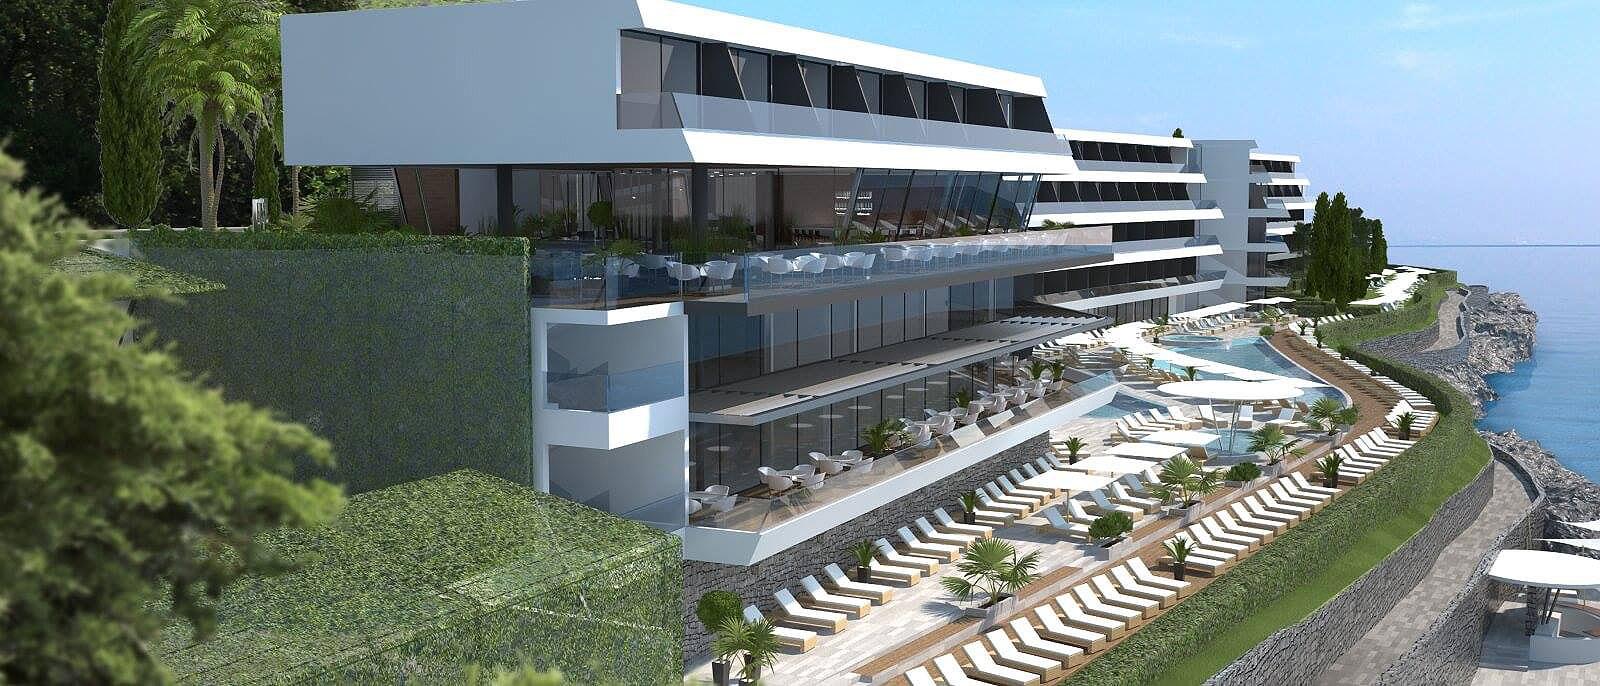 [PHOTOS] Impressive New Hotel for Ičići Near Opatija